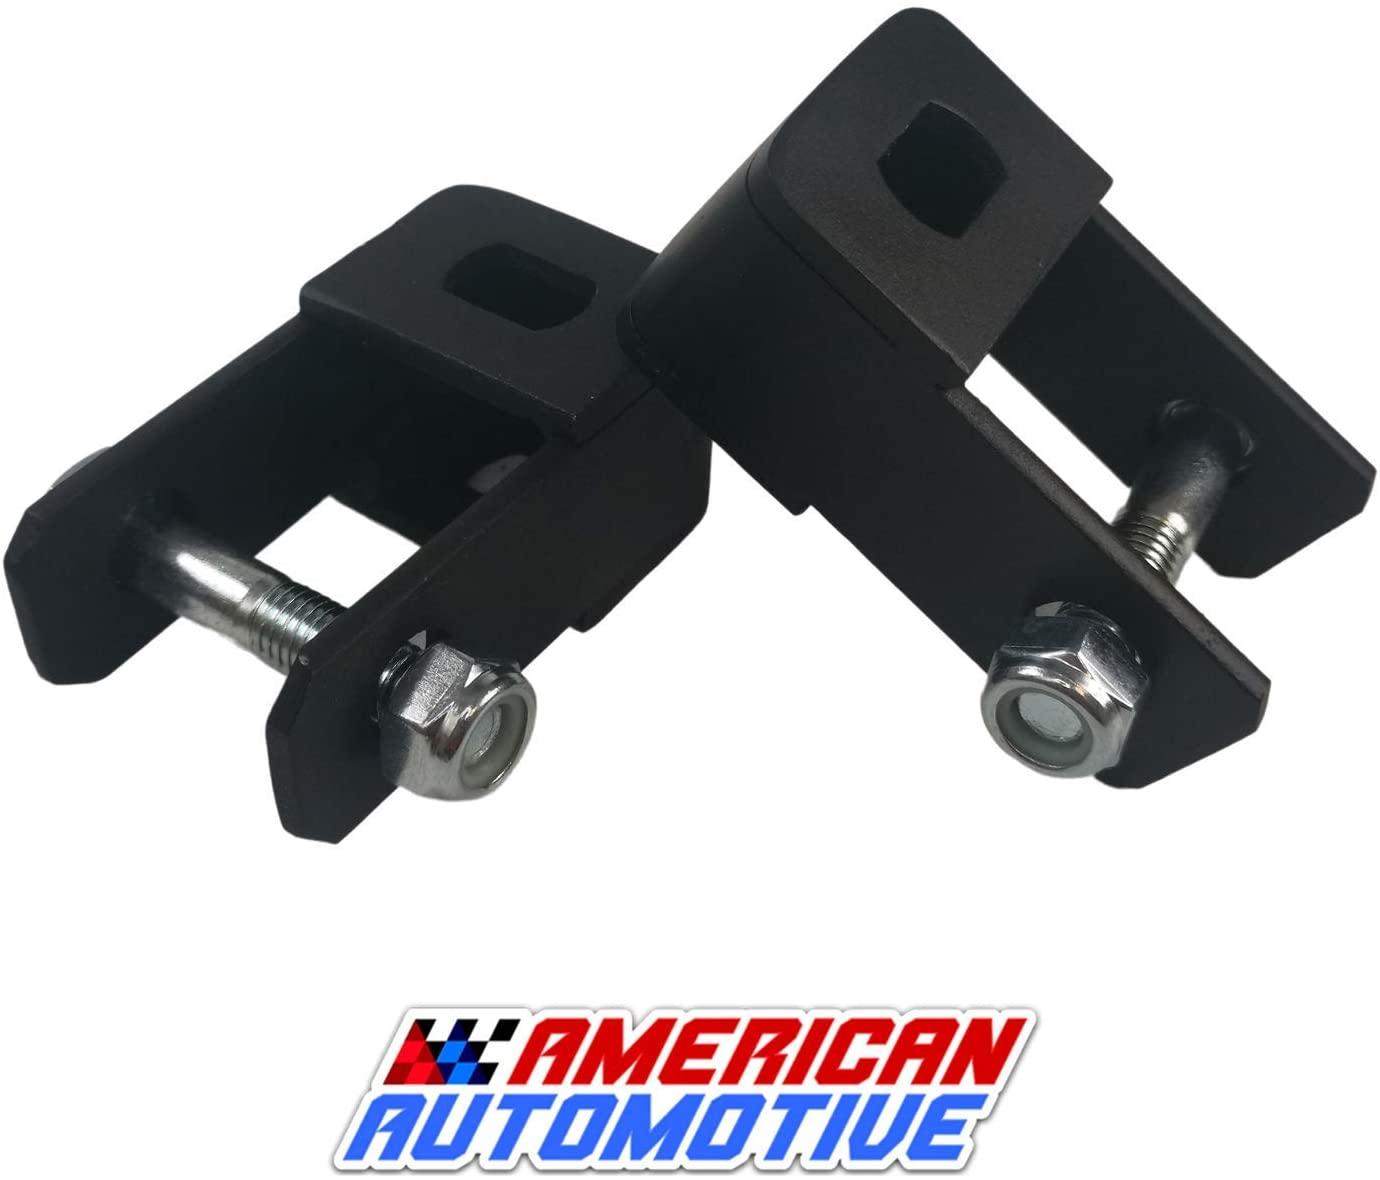 American Automotive 1994-2016 Ram 2500 3500 2WD 4WD 2-4